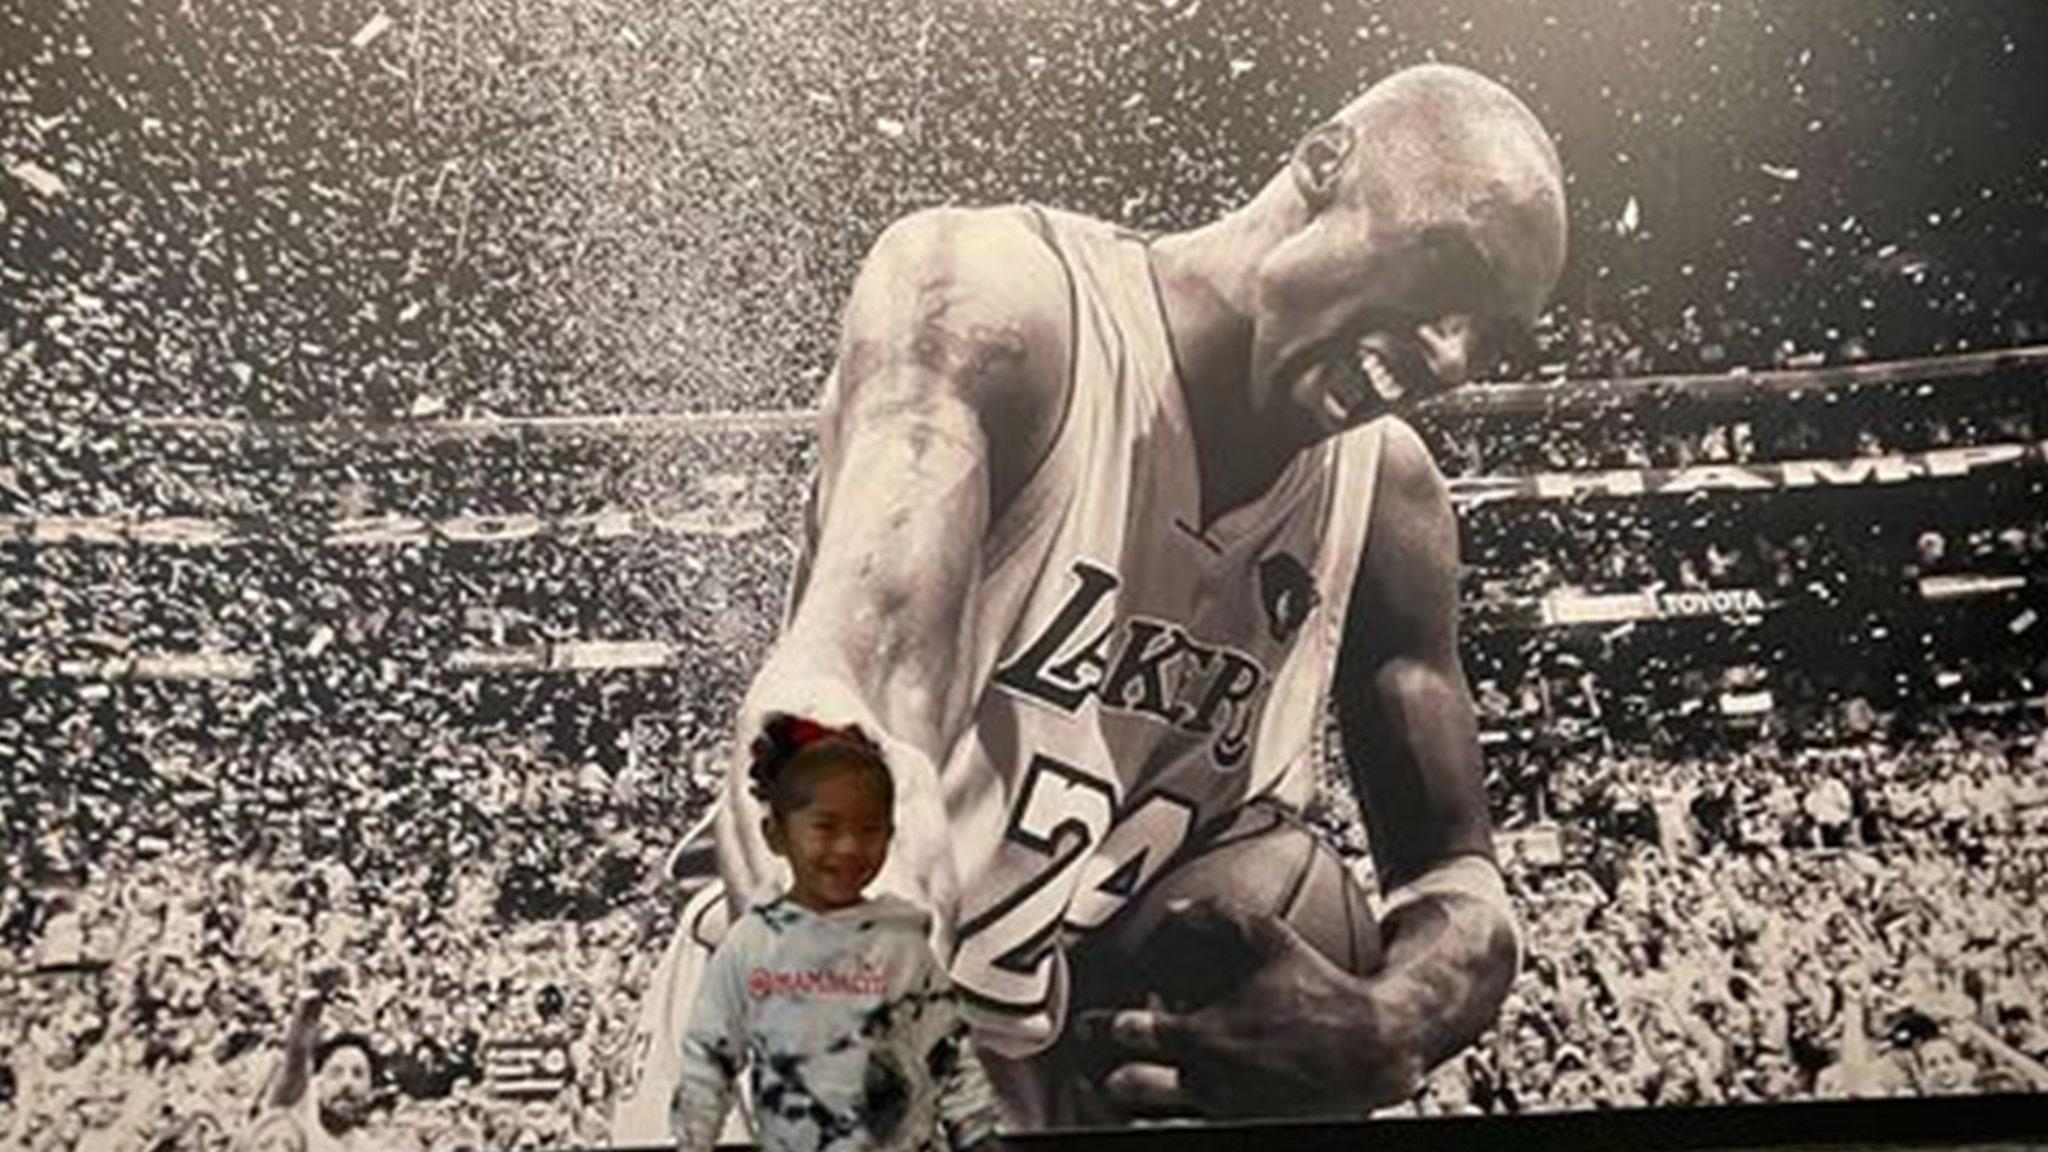 Kobe Bryant's Wife, Daughters Visit Hall Of Fame Exhibit, 'Love You Always' - WorldNewsEra